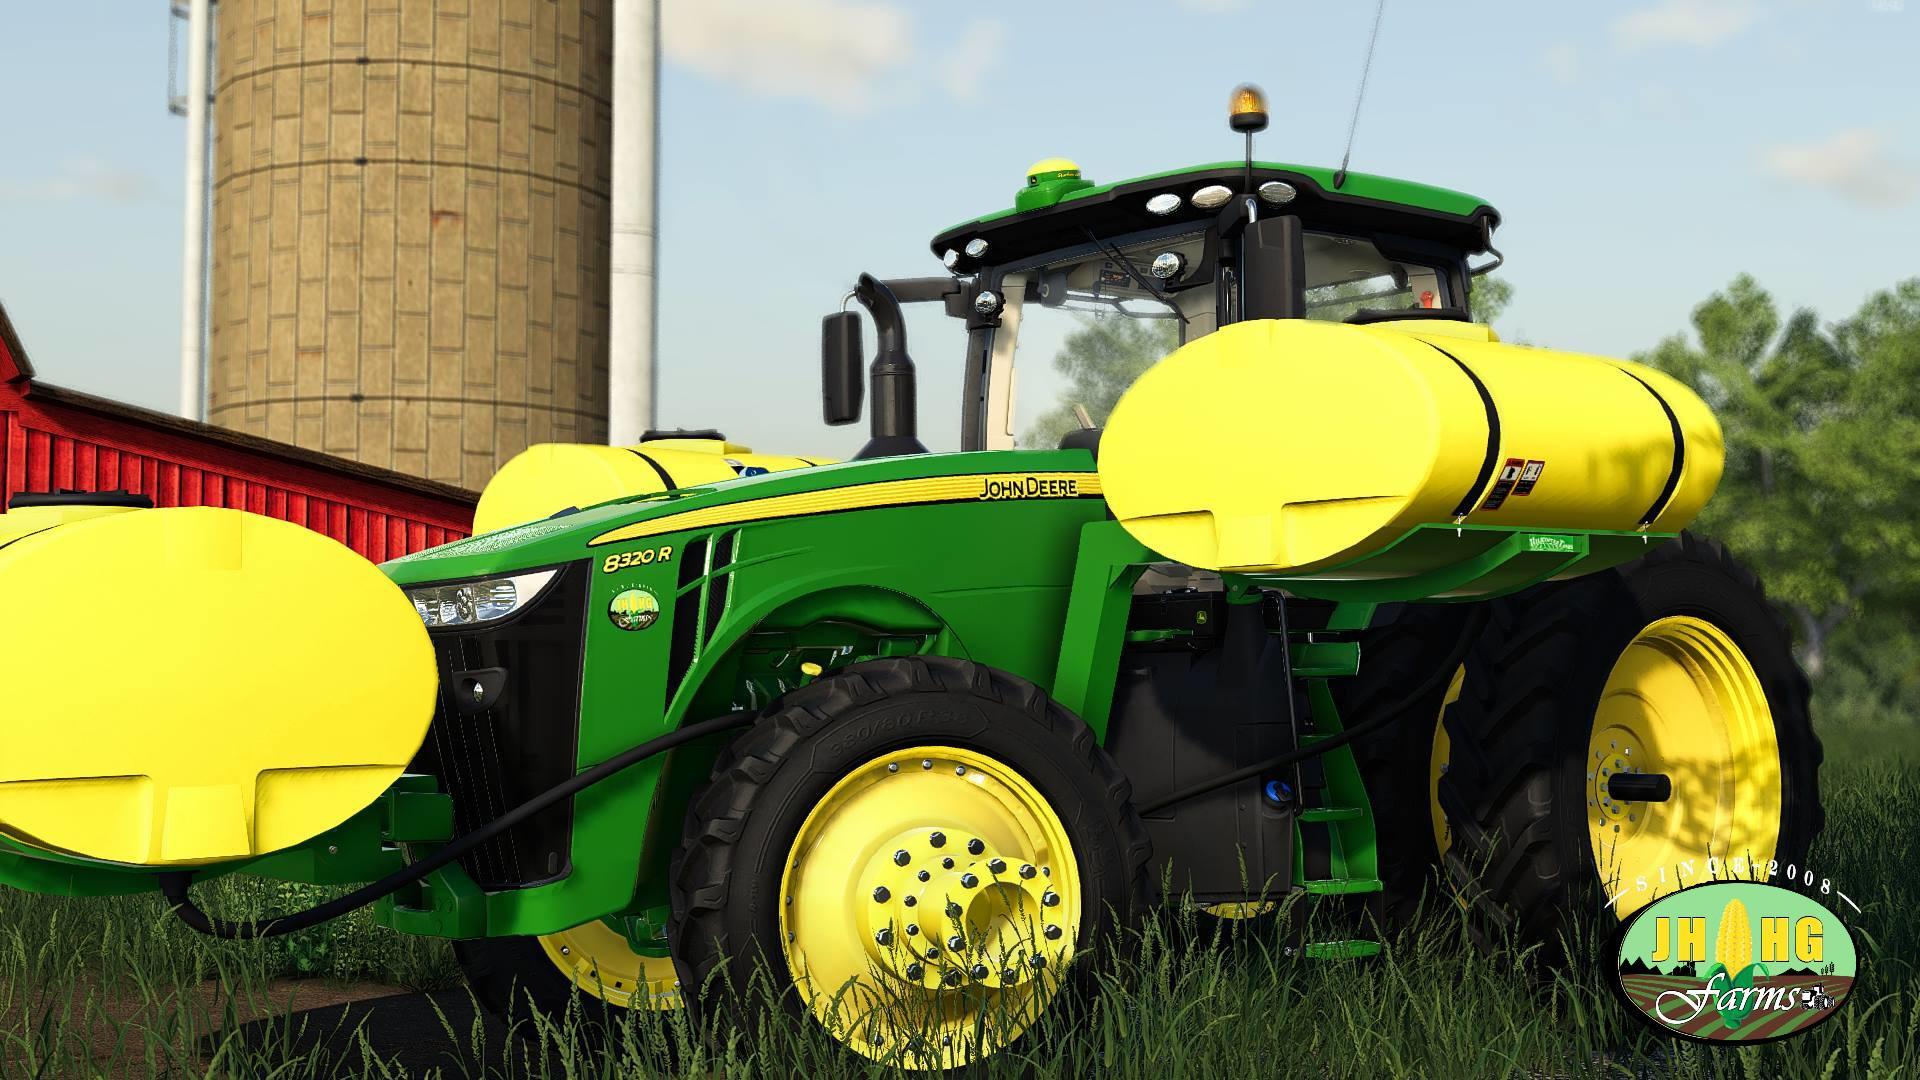 John Deere Gifts >> LS2019 Helicopter Tanks v1.0 - Farming Simulator 19 mod ...